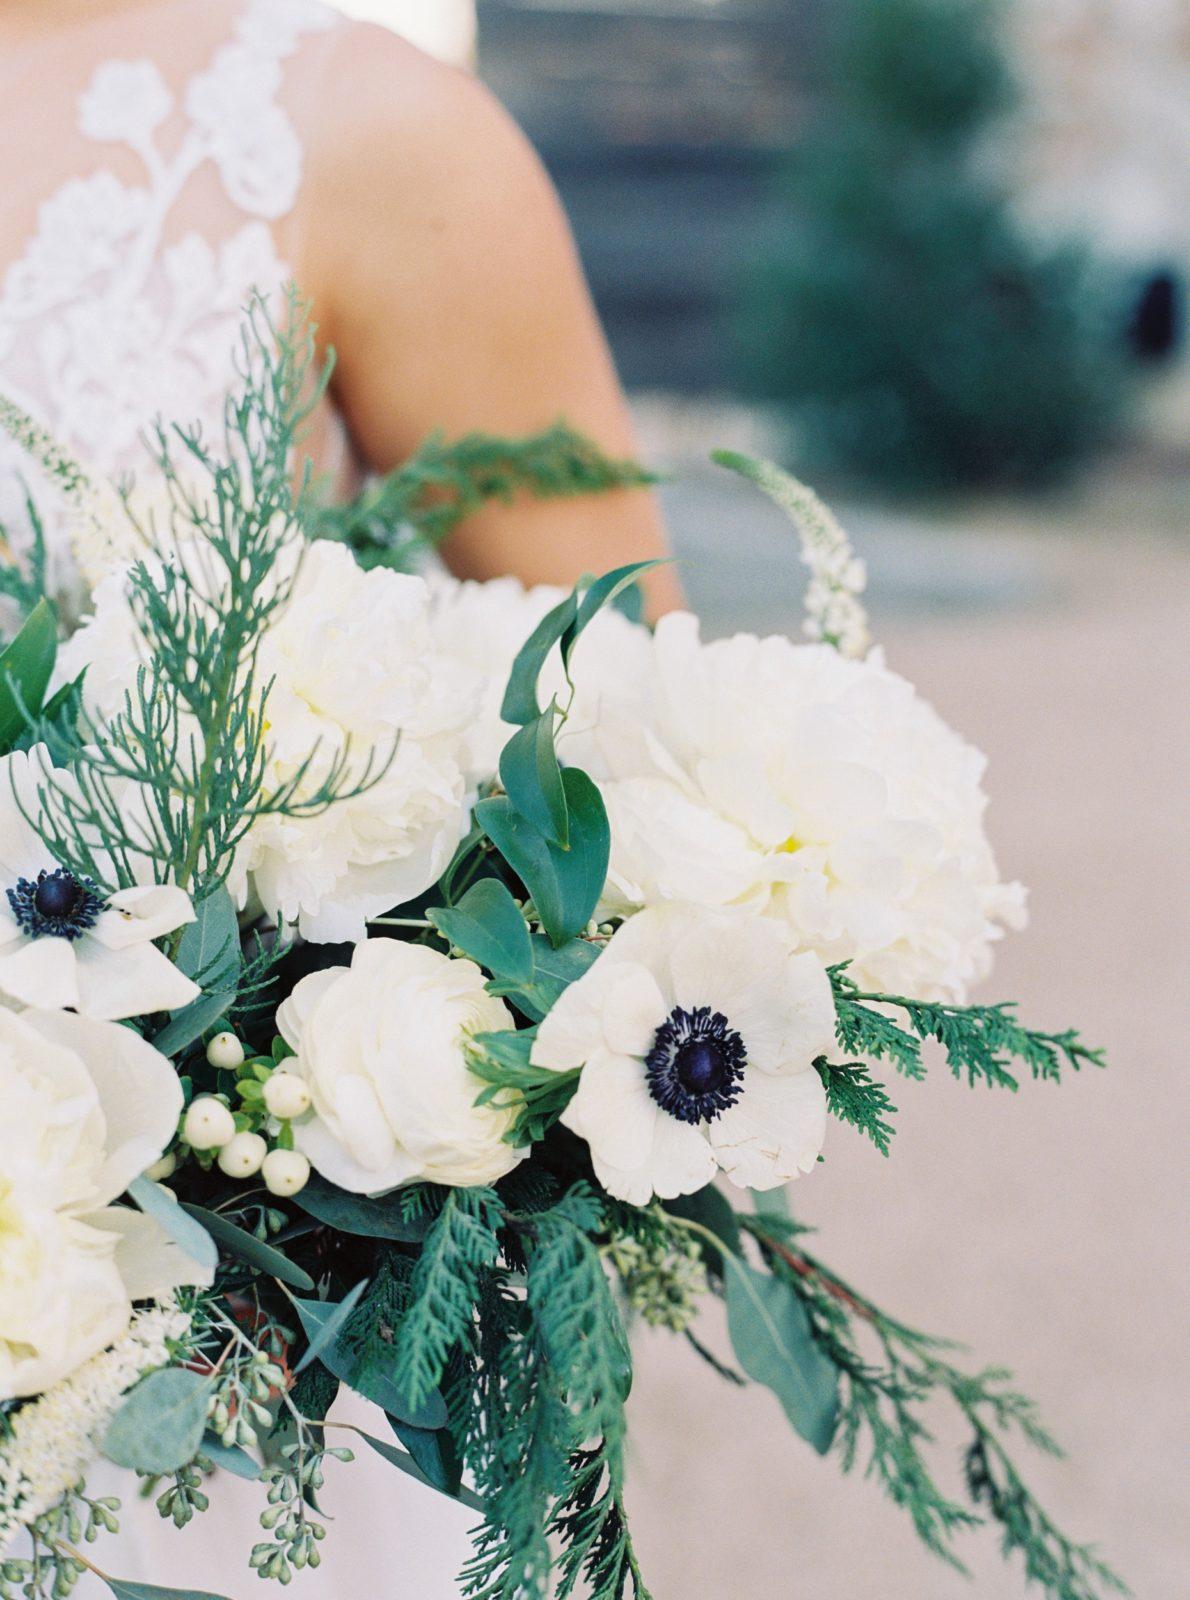 Alba Dahlia Floral Wedding Bouquet: Monica Alberty DFW Wedding Photography featured on Alexa Kay Events